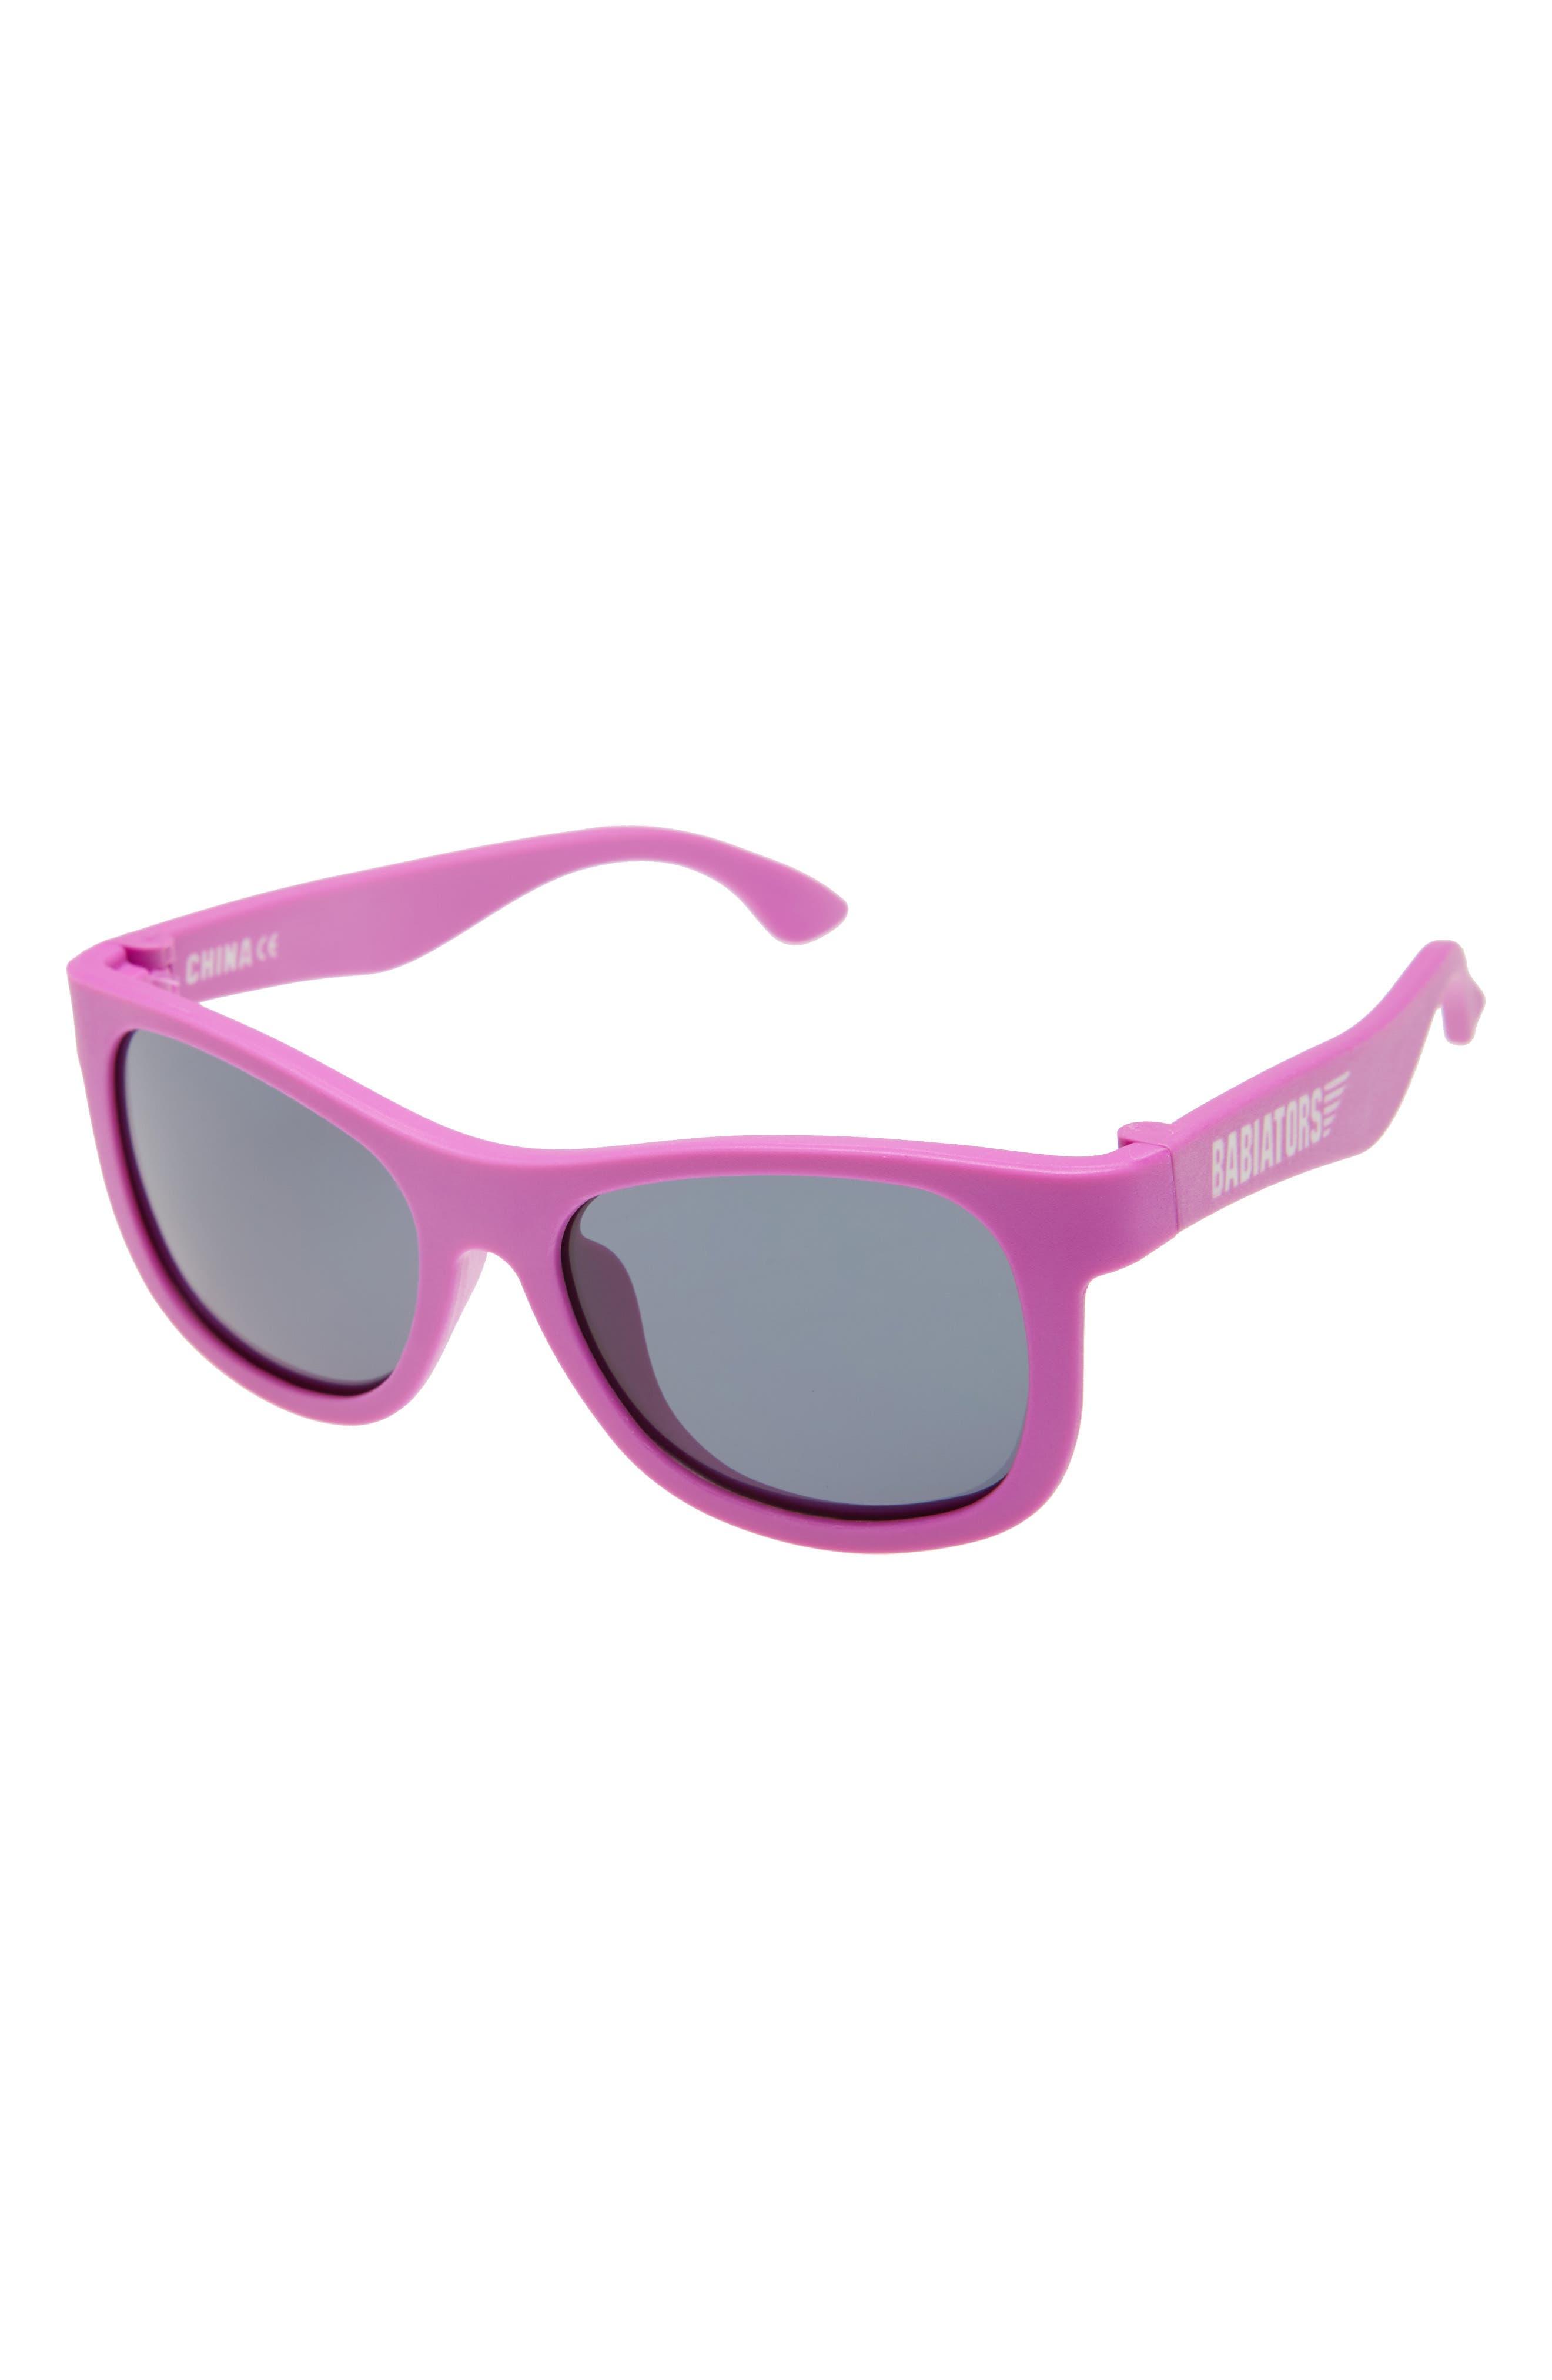 Original Navigators Sunglasses,                             Main thumbnail 3, color,